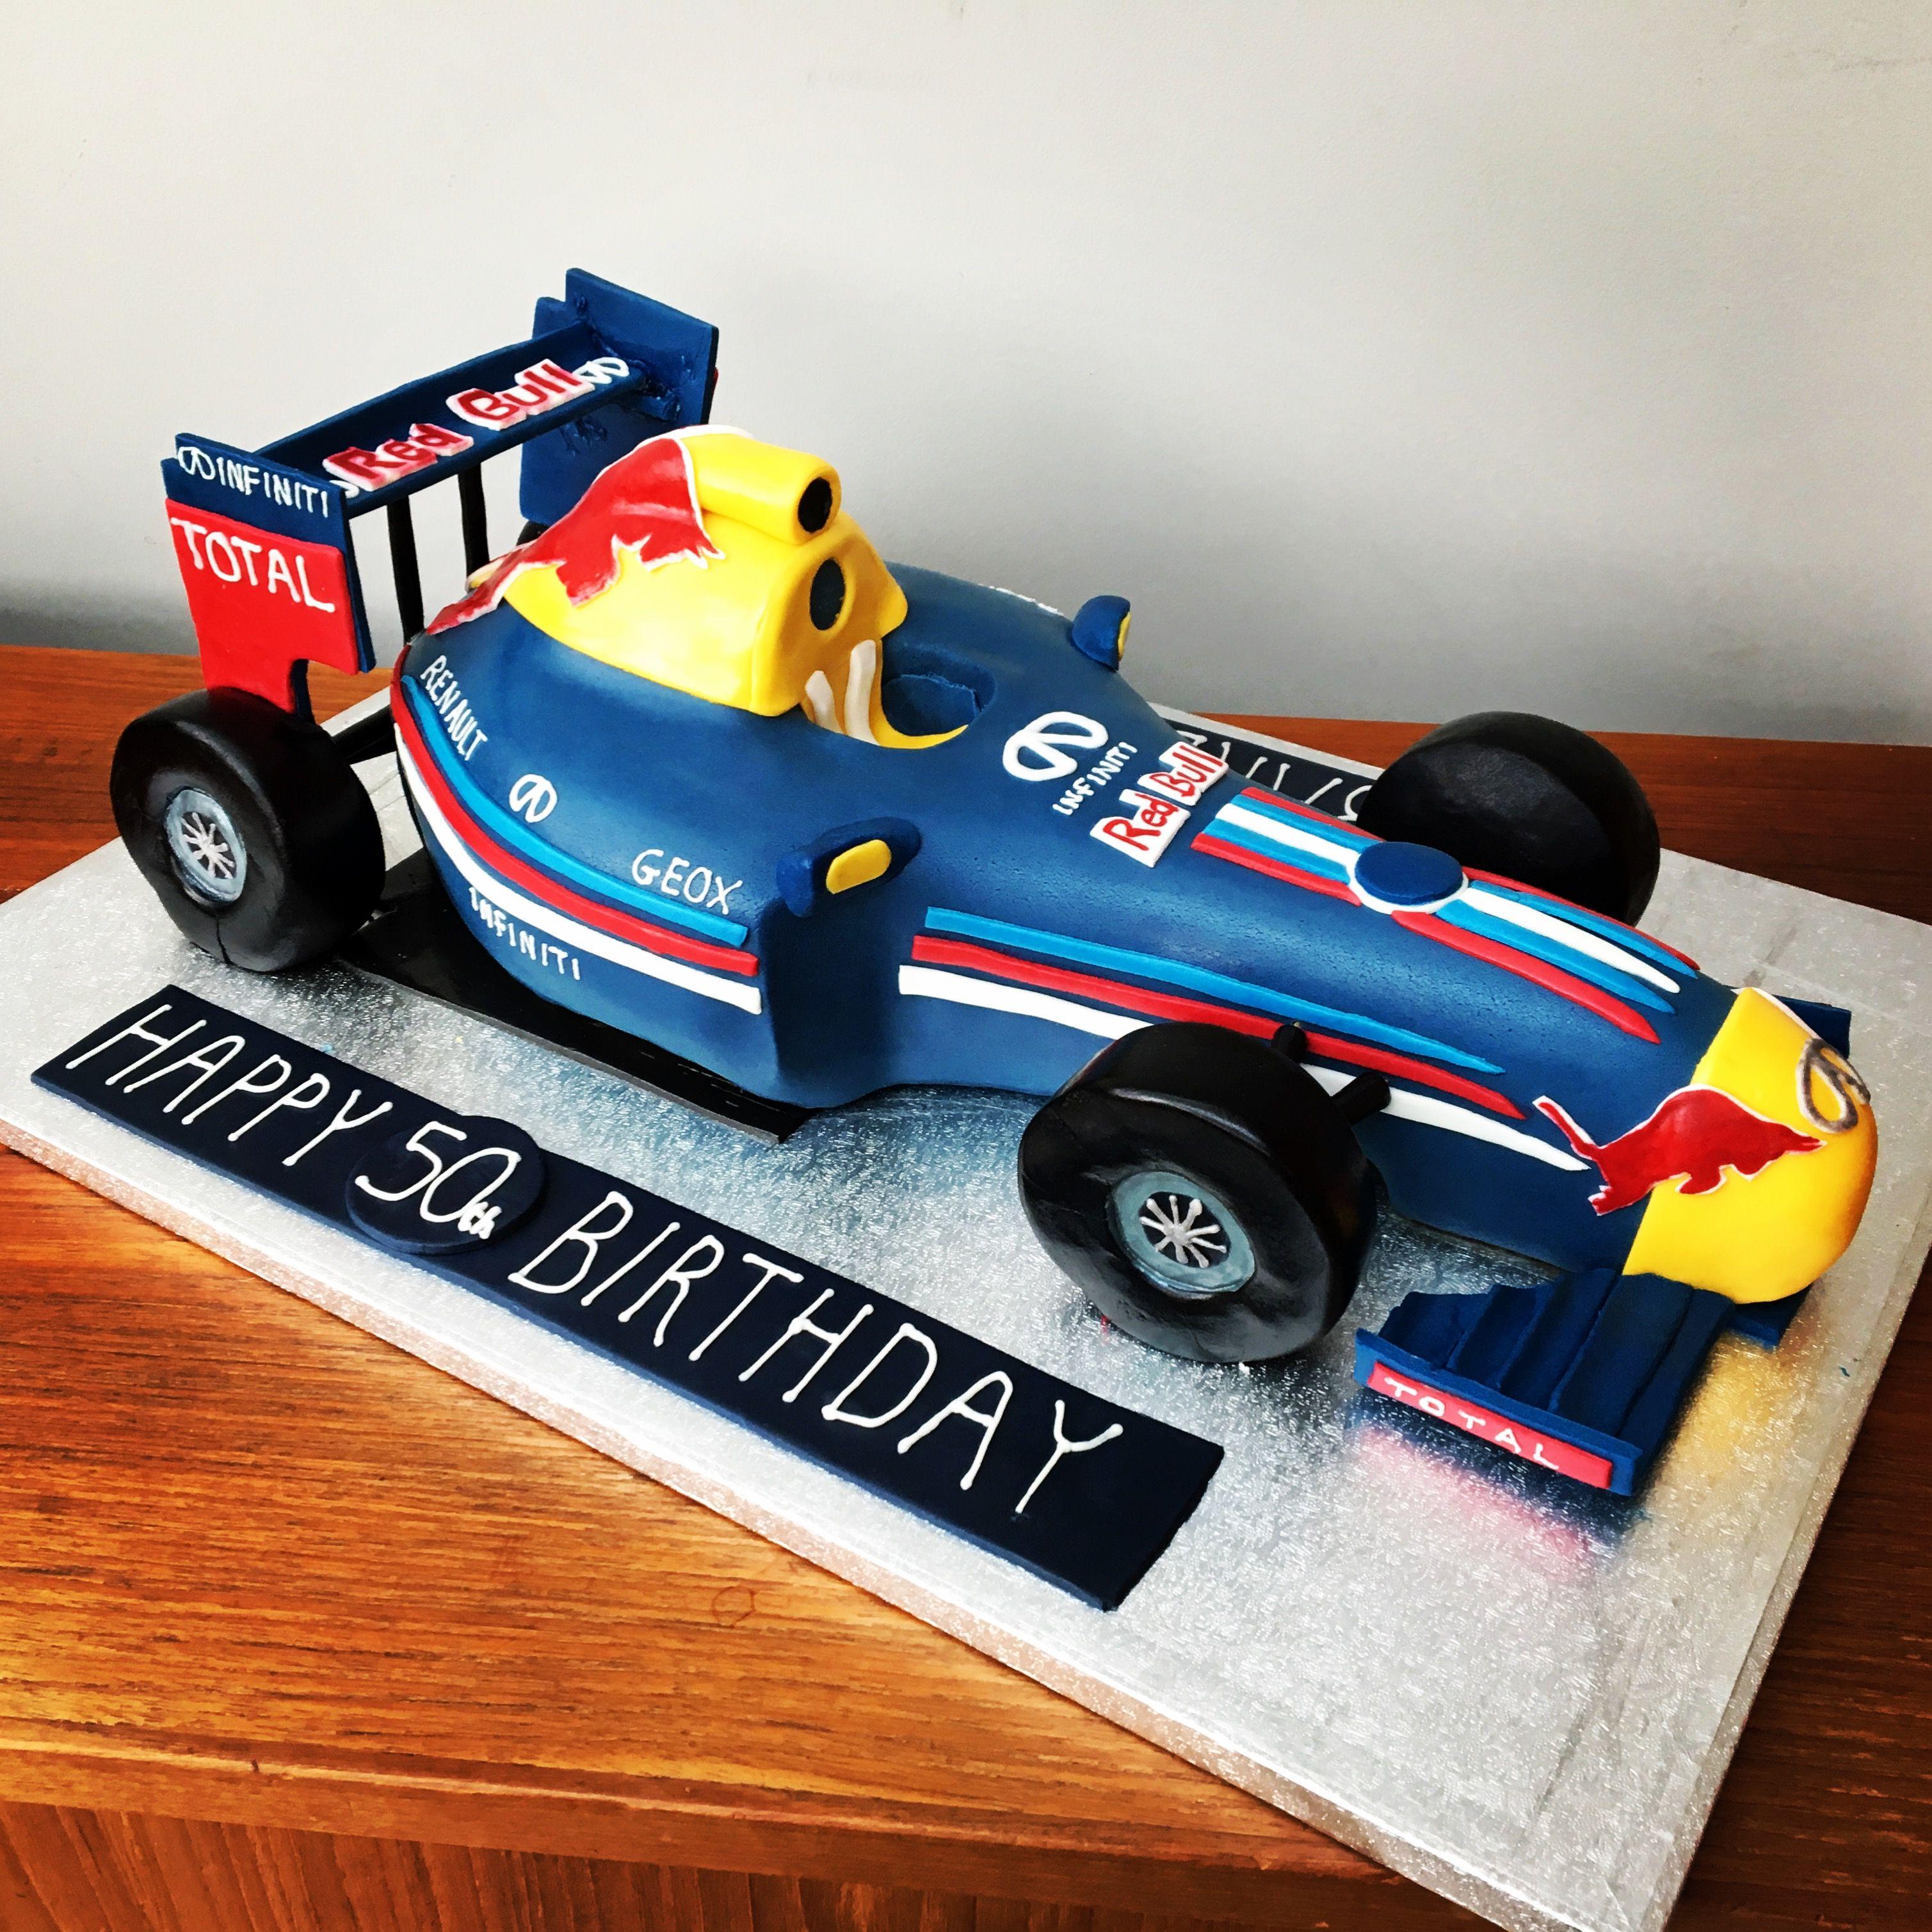 esta veinte Campeonato  Red bull formula 1 racing car birthday cake | Cars birthday cake